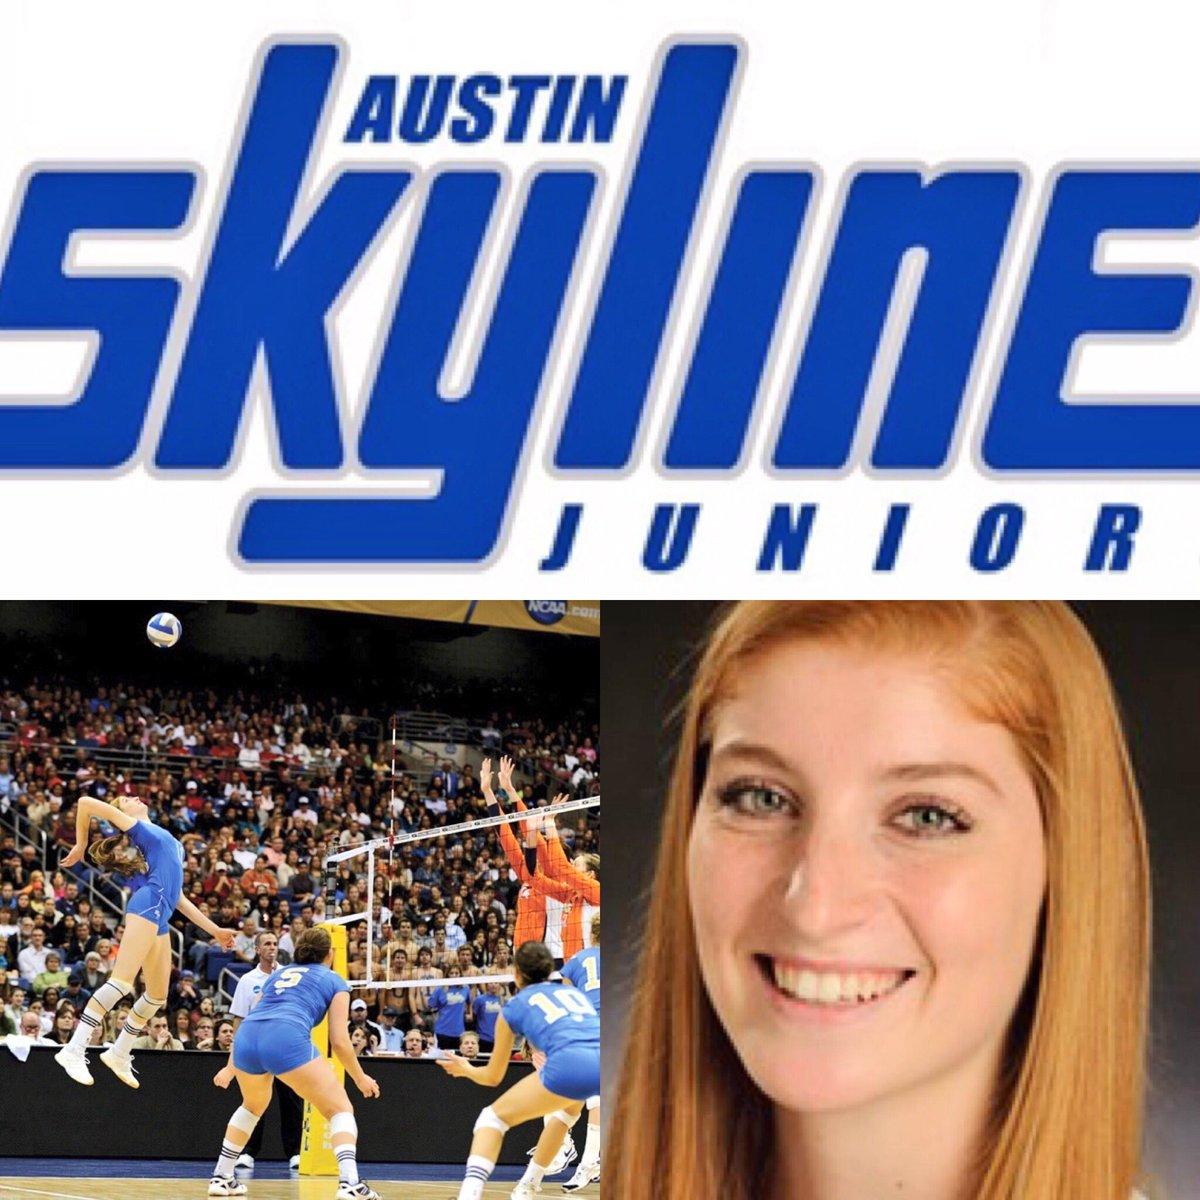 Austin Skyline Jrs On Twitter Austin Skyline Welcomes 14 Royal Head Coach Rachael Kidder To Austin Skylinejrs